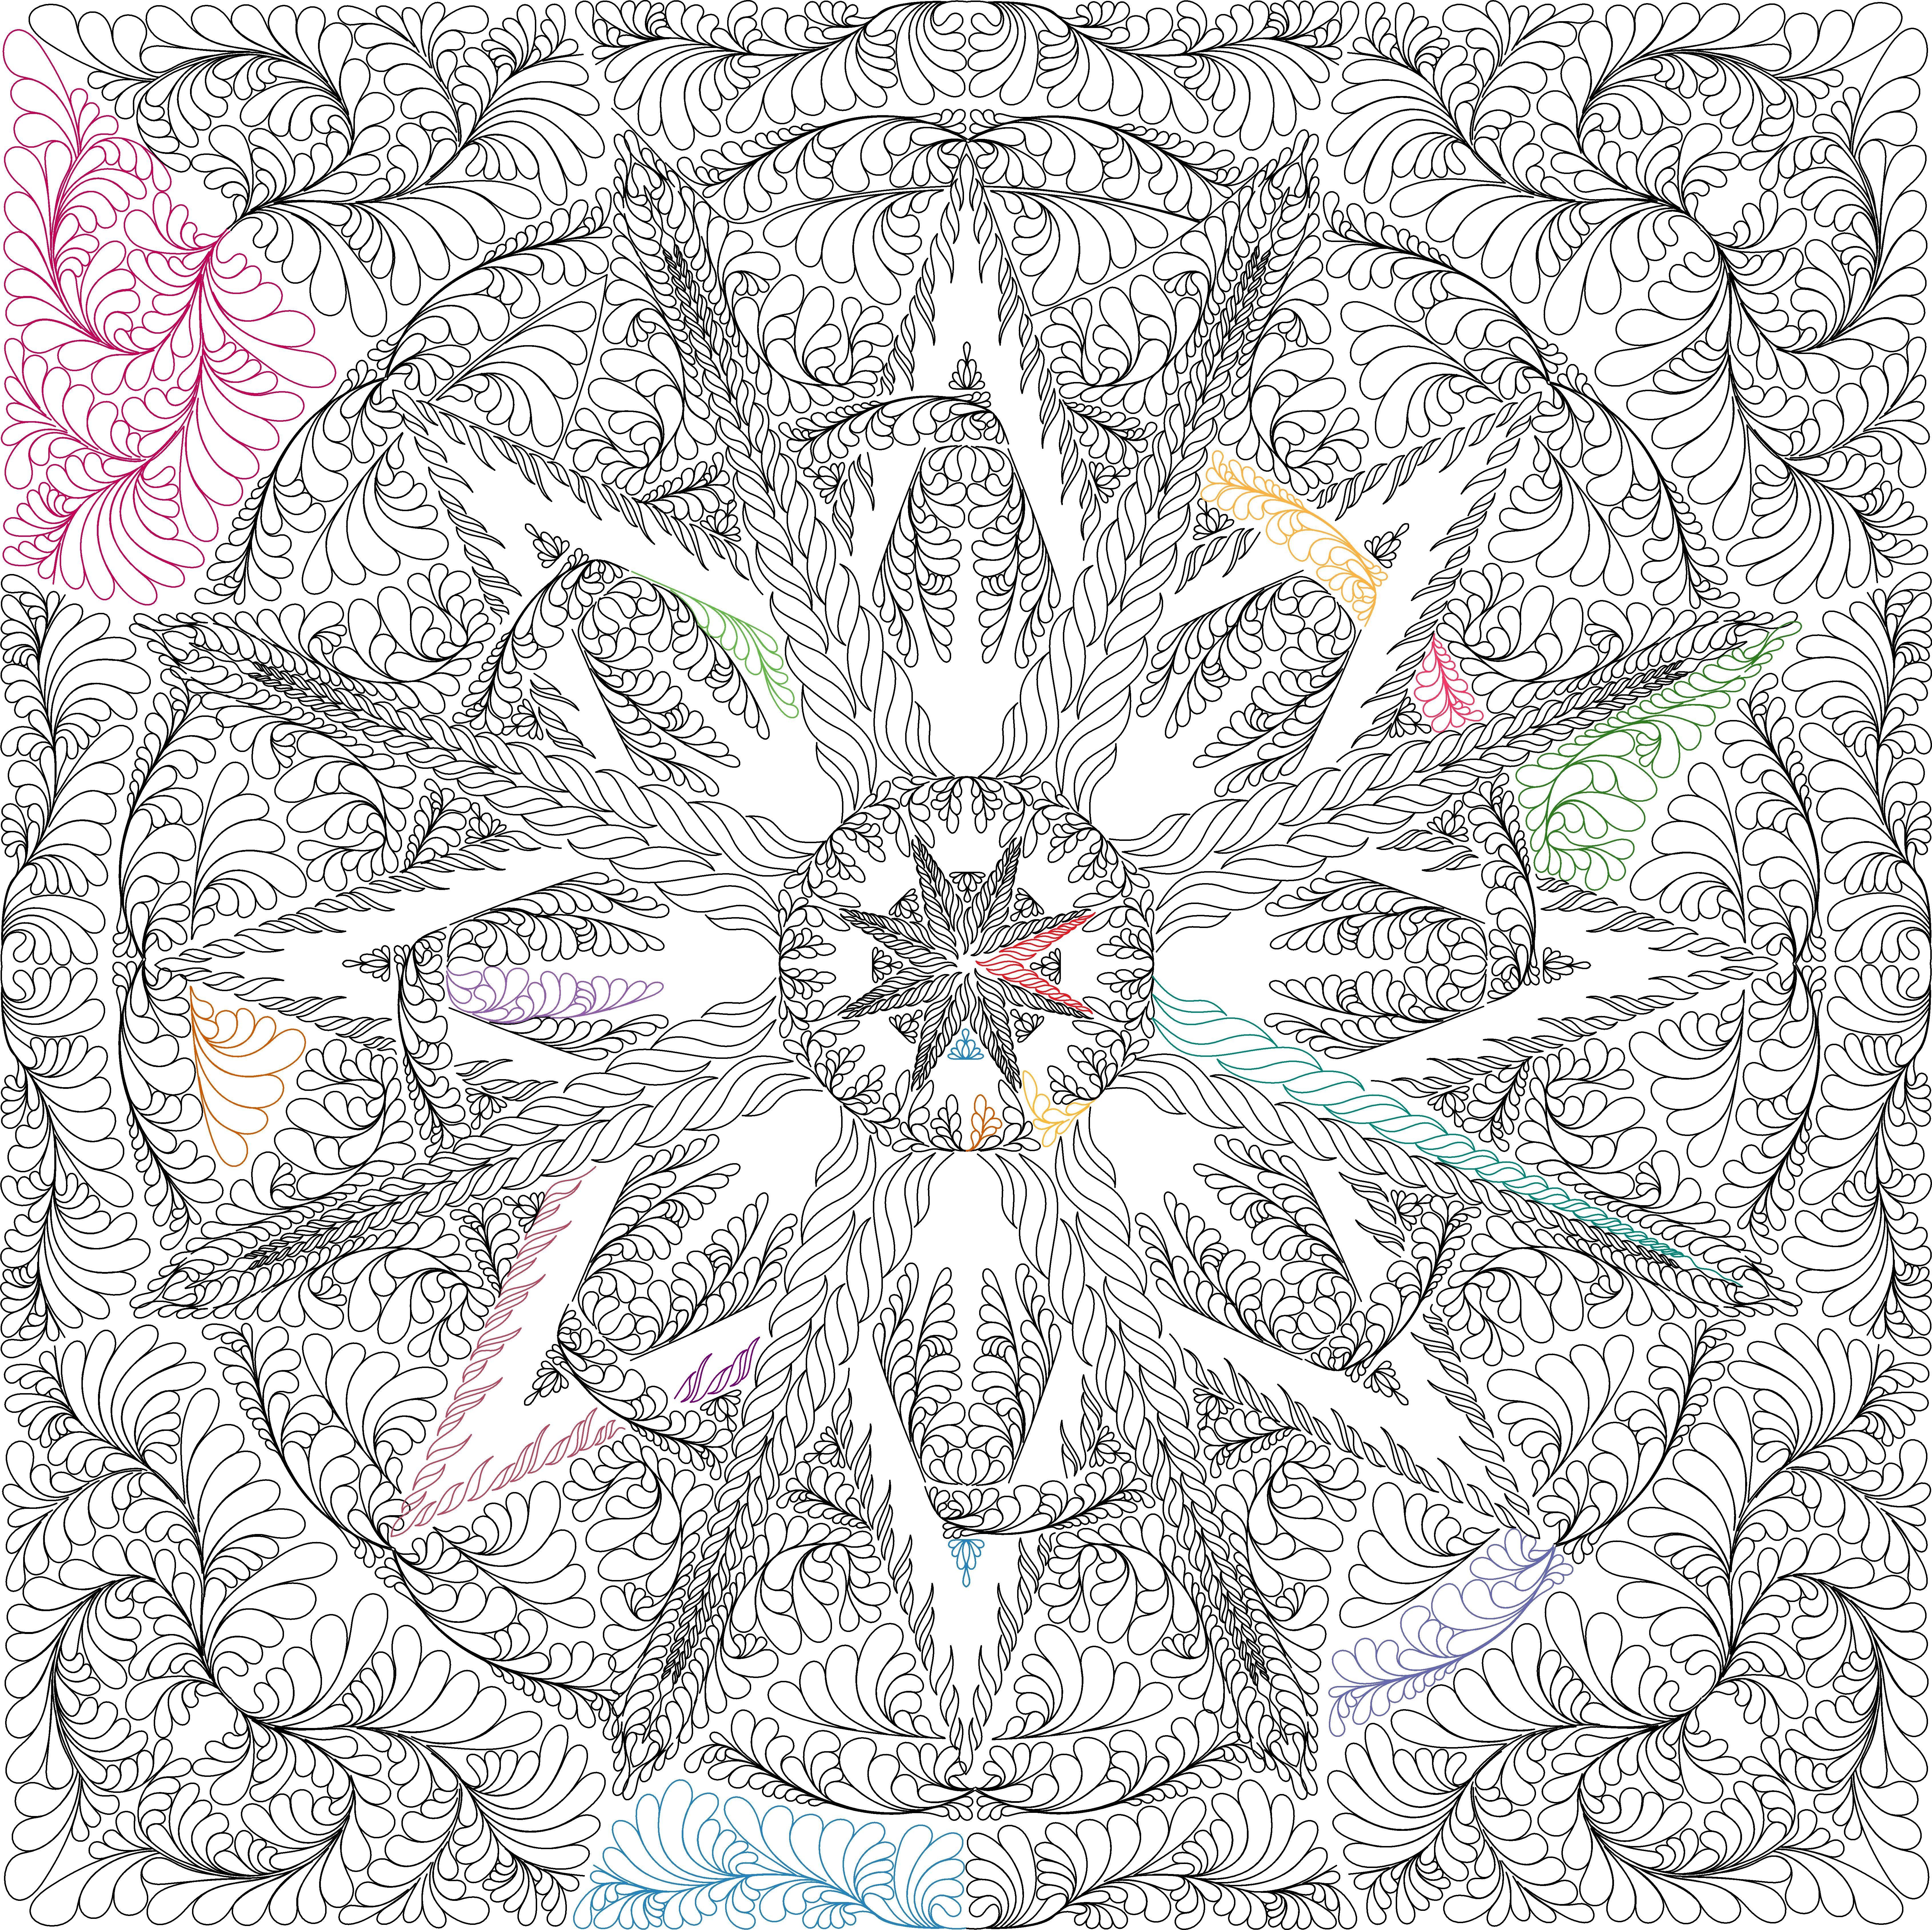 Mariner\'s Compass Quilting Design | Quiltworx.com | Pinterest ...